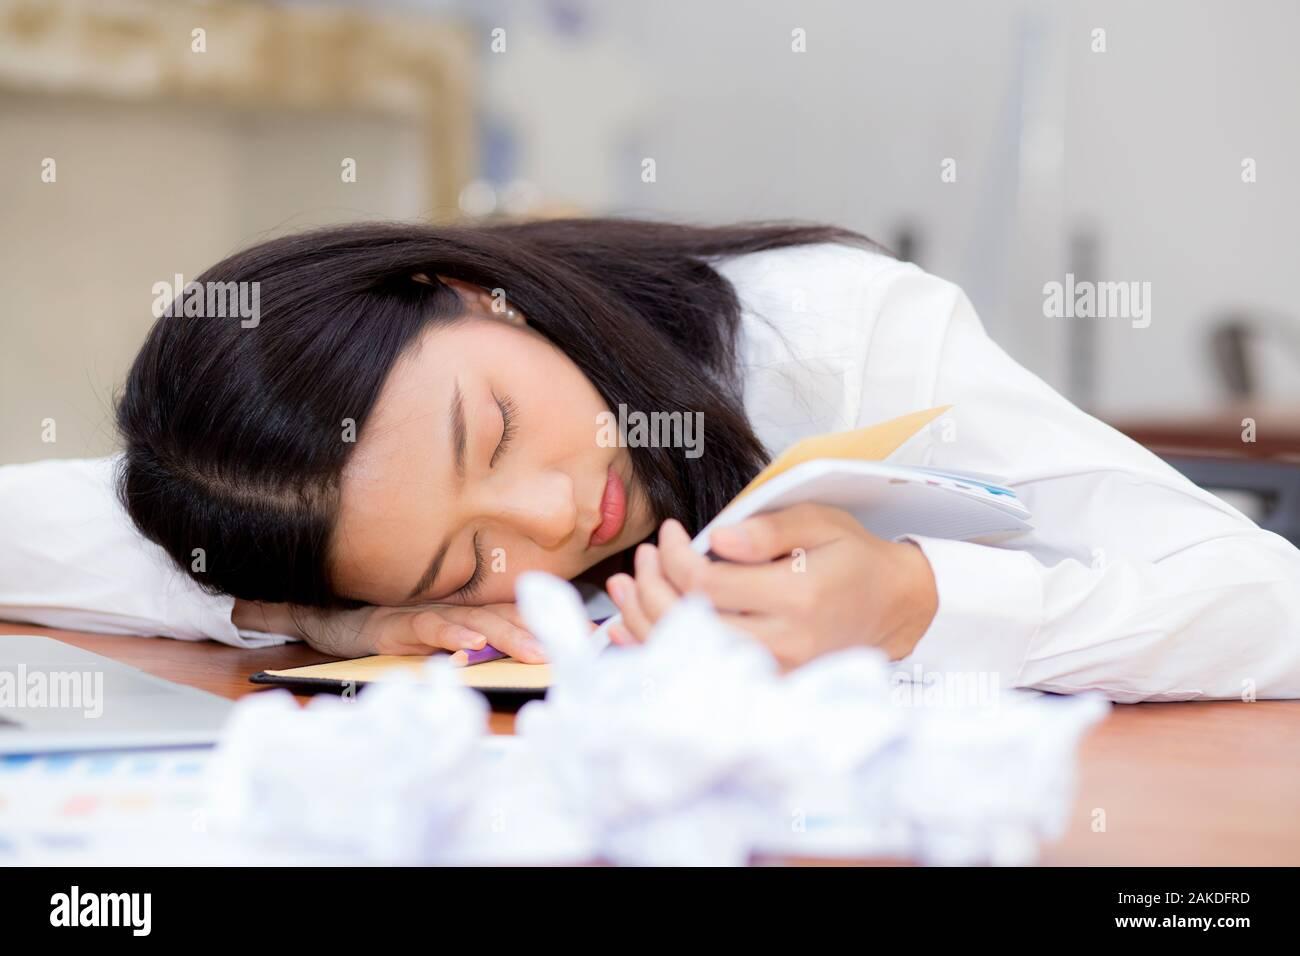 сон девушка с работы